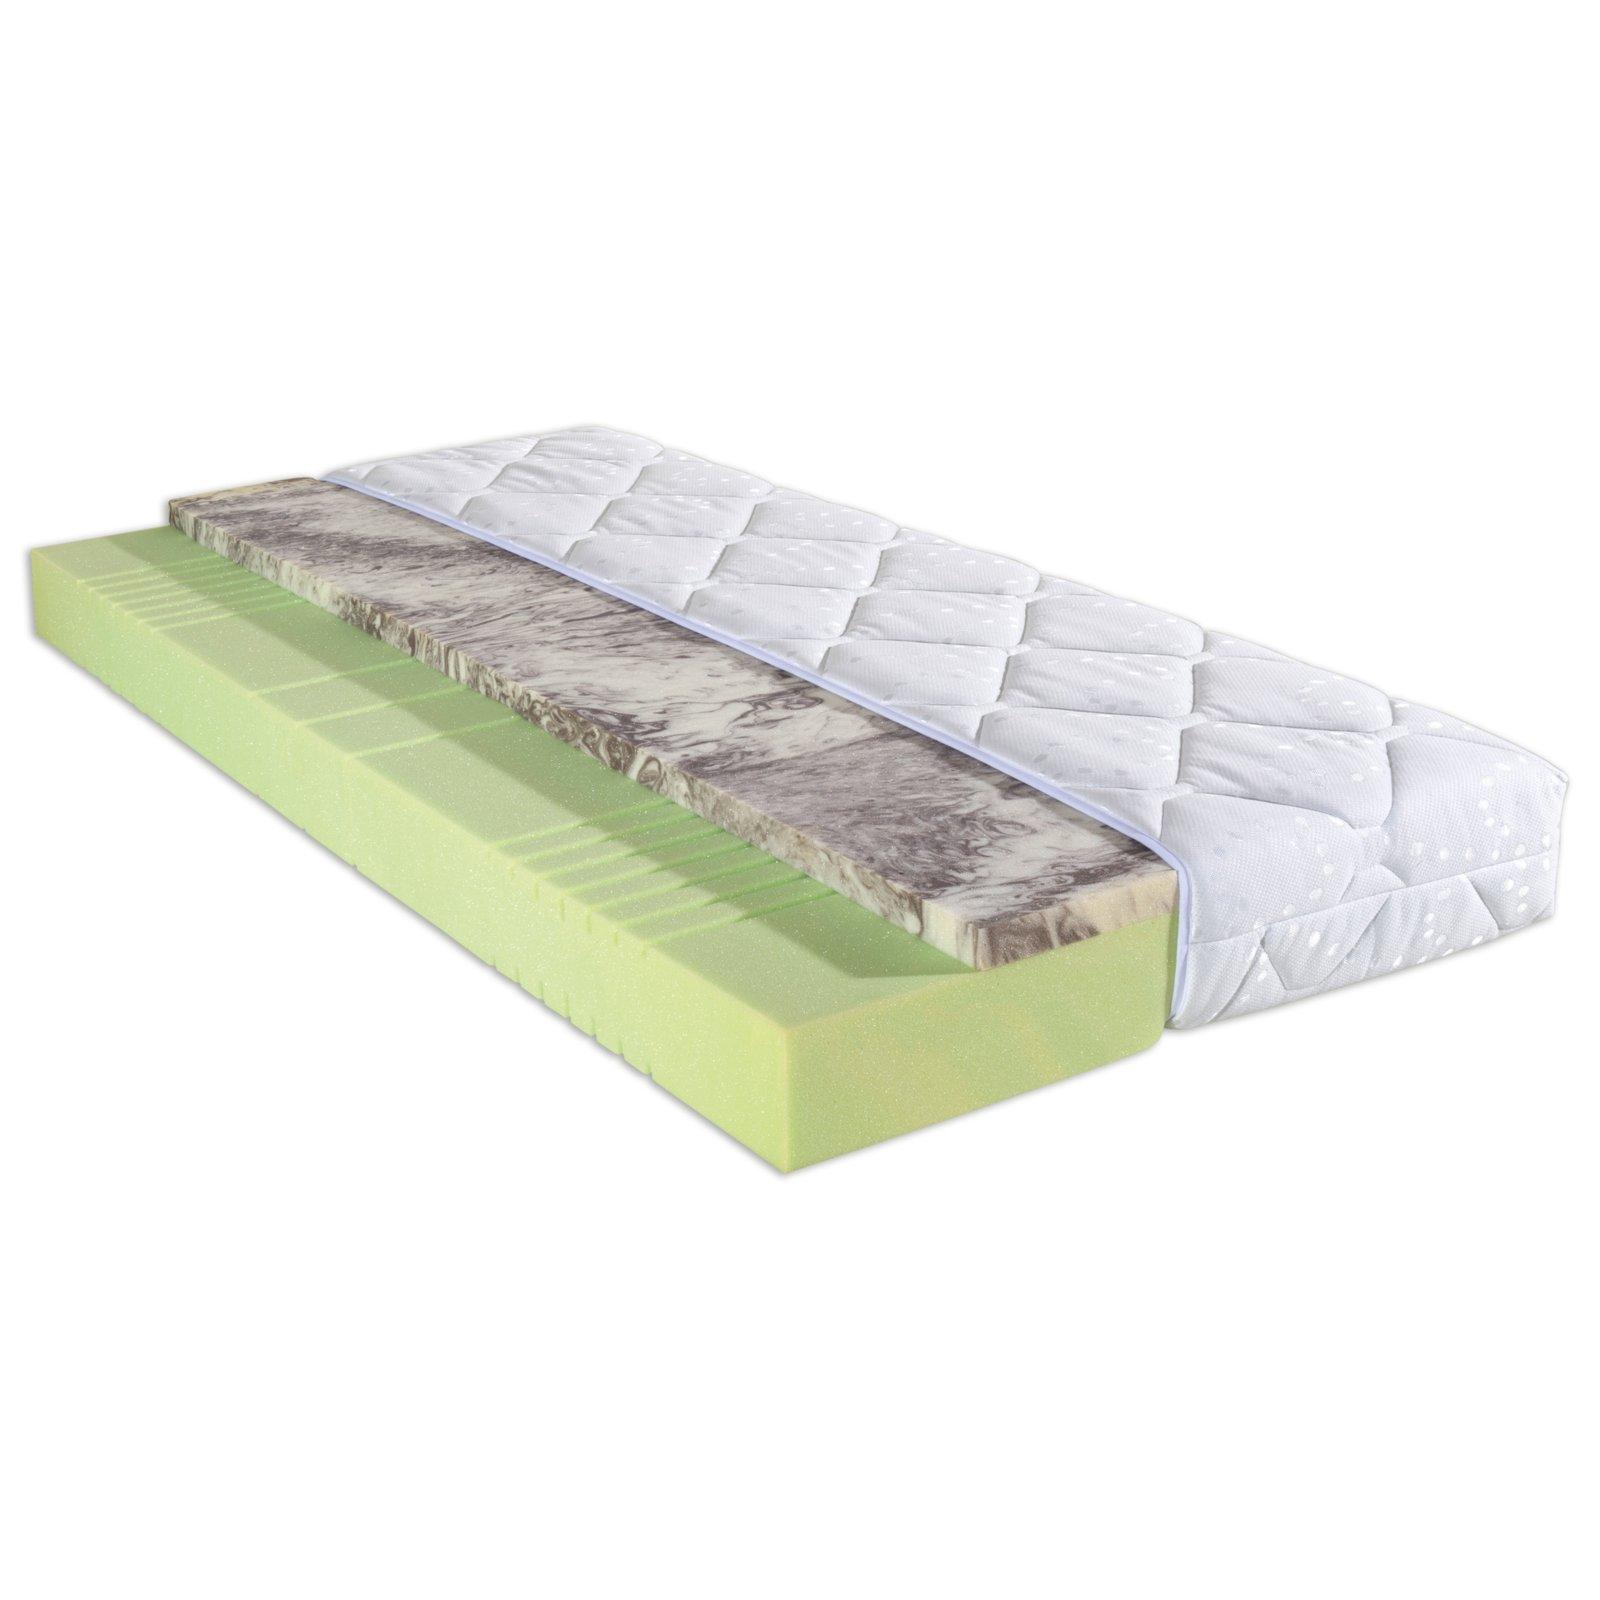 gel matratze 90x200 gel matratzen topper topper gel contact test with gel matratze 90x200. Black Bedroom Furniture Sets. Home Design Ideas